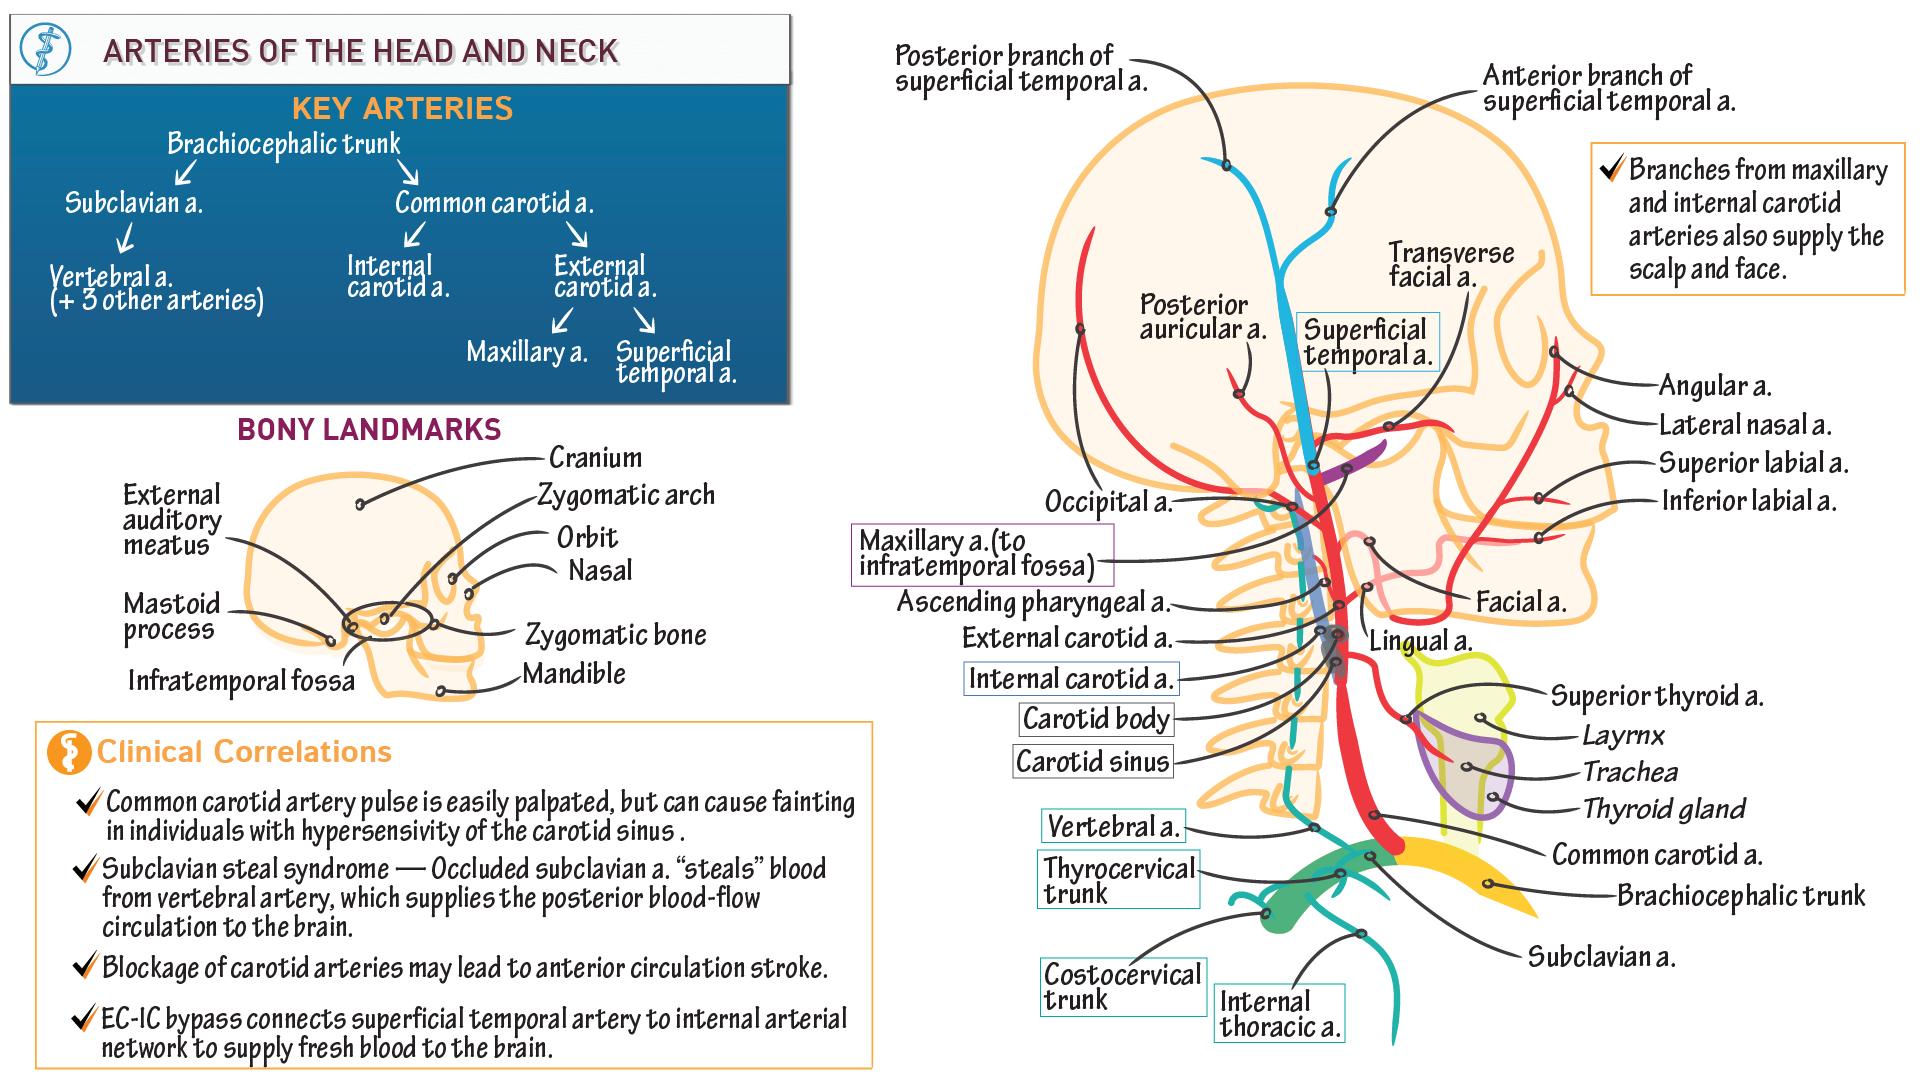 Neuroanatomy: Arteries of Head and Neck | Draw It to Know It